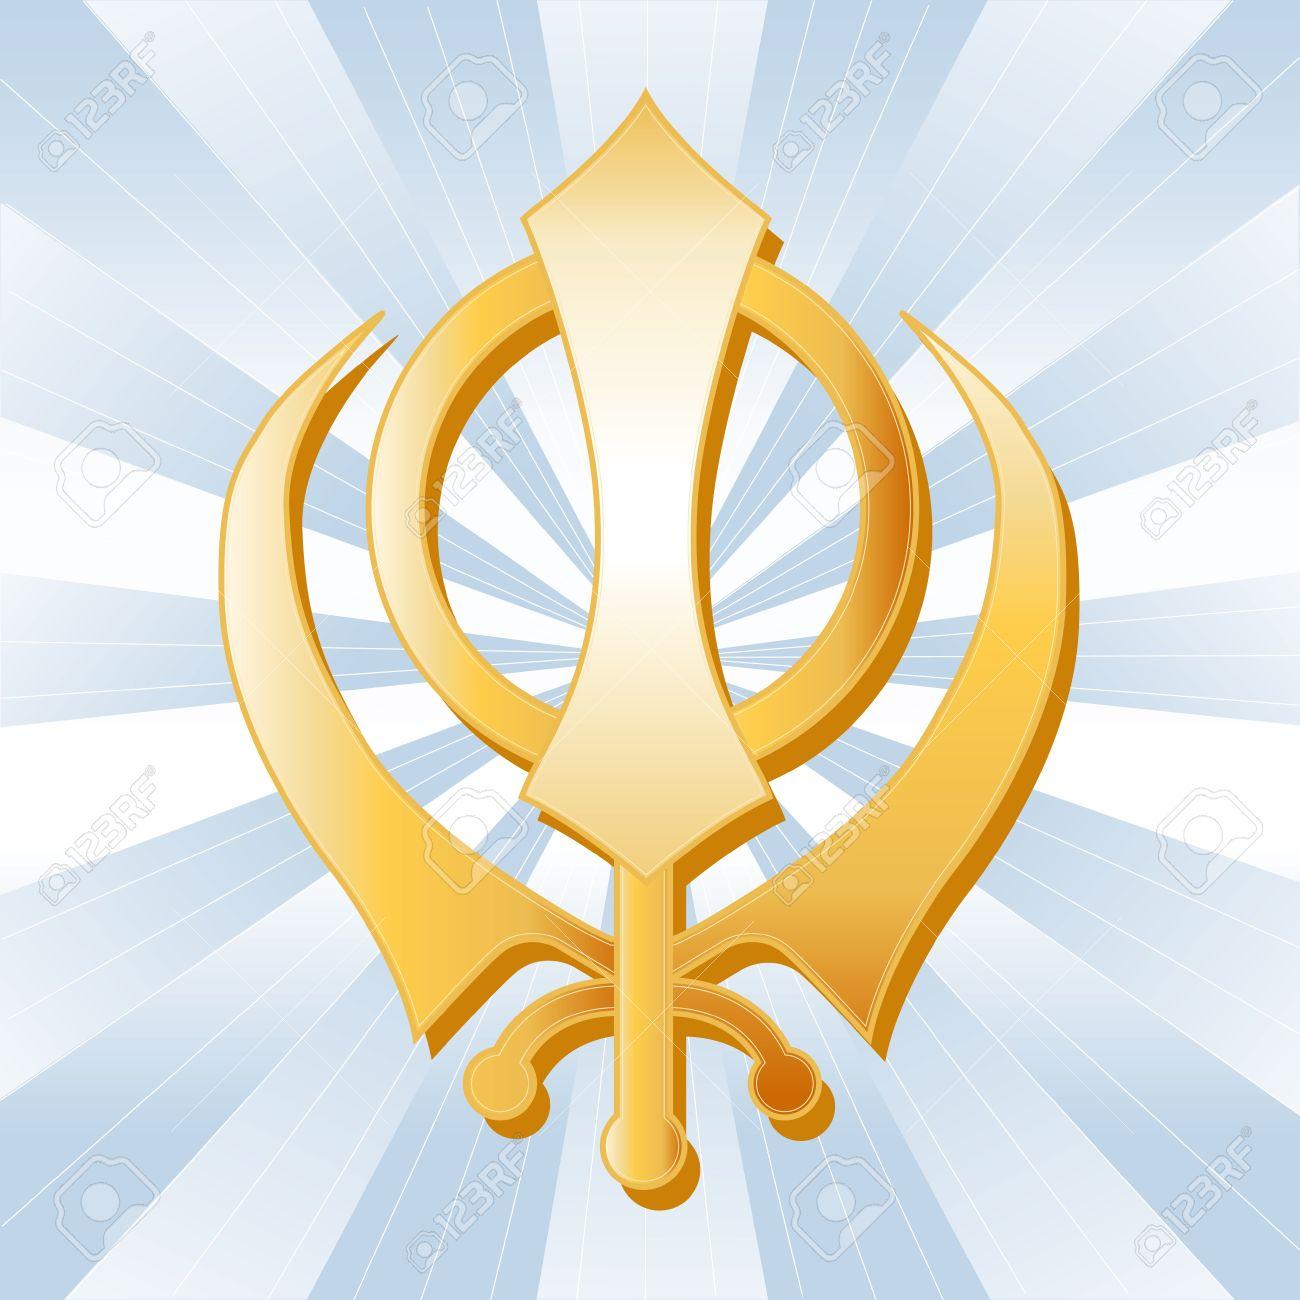 Sikh Symbol, Golden Khanda, icon of the Sikh faith on a sky blue ray background. Stock Vector - 11837263